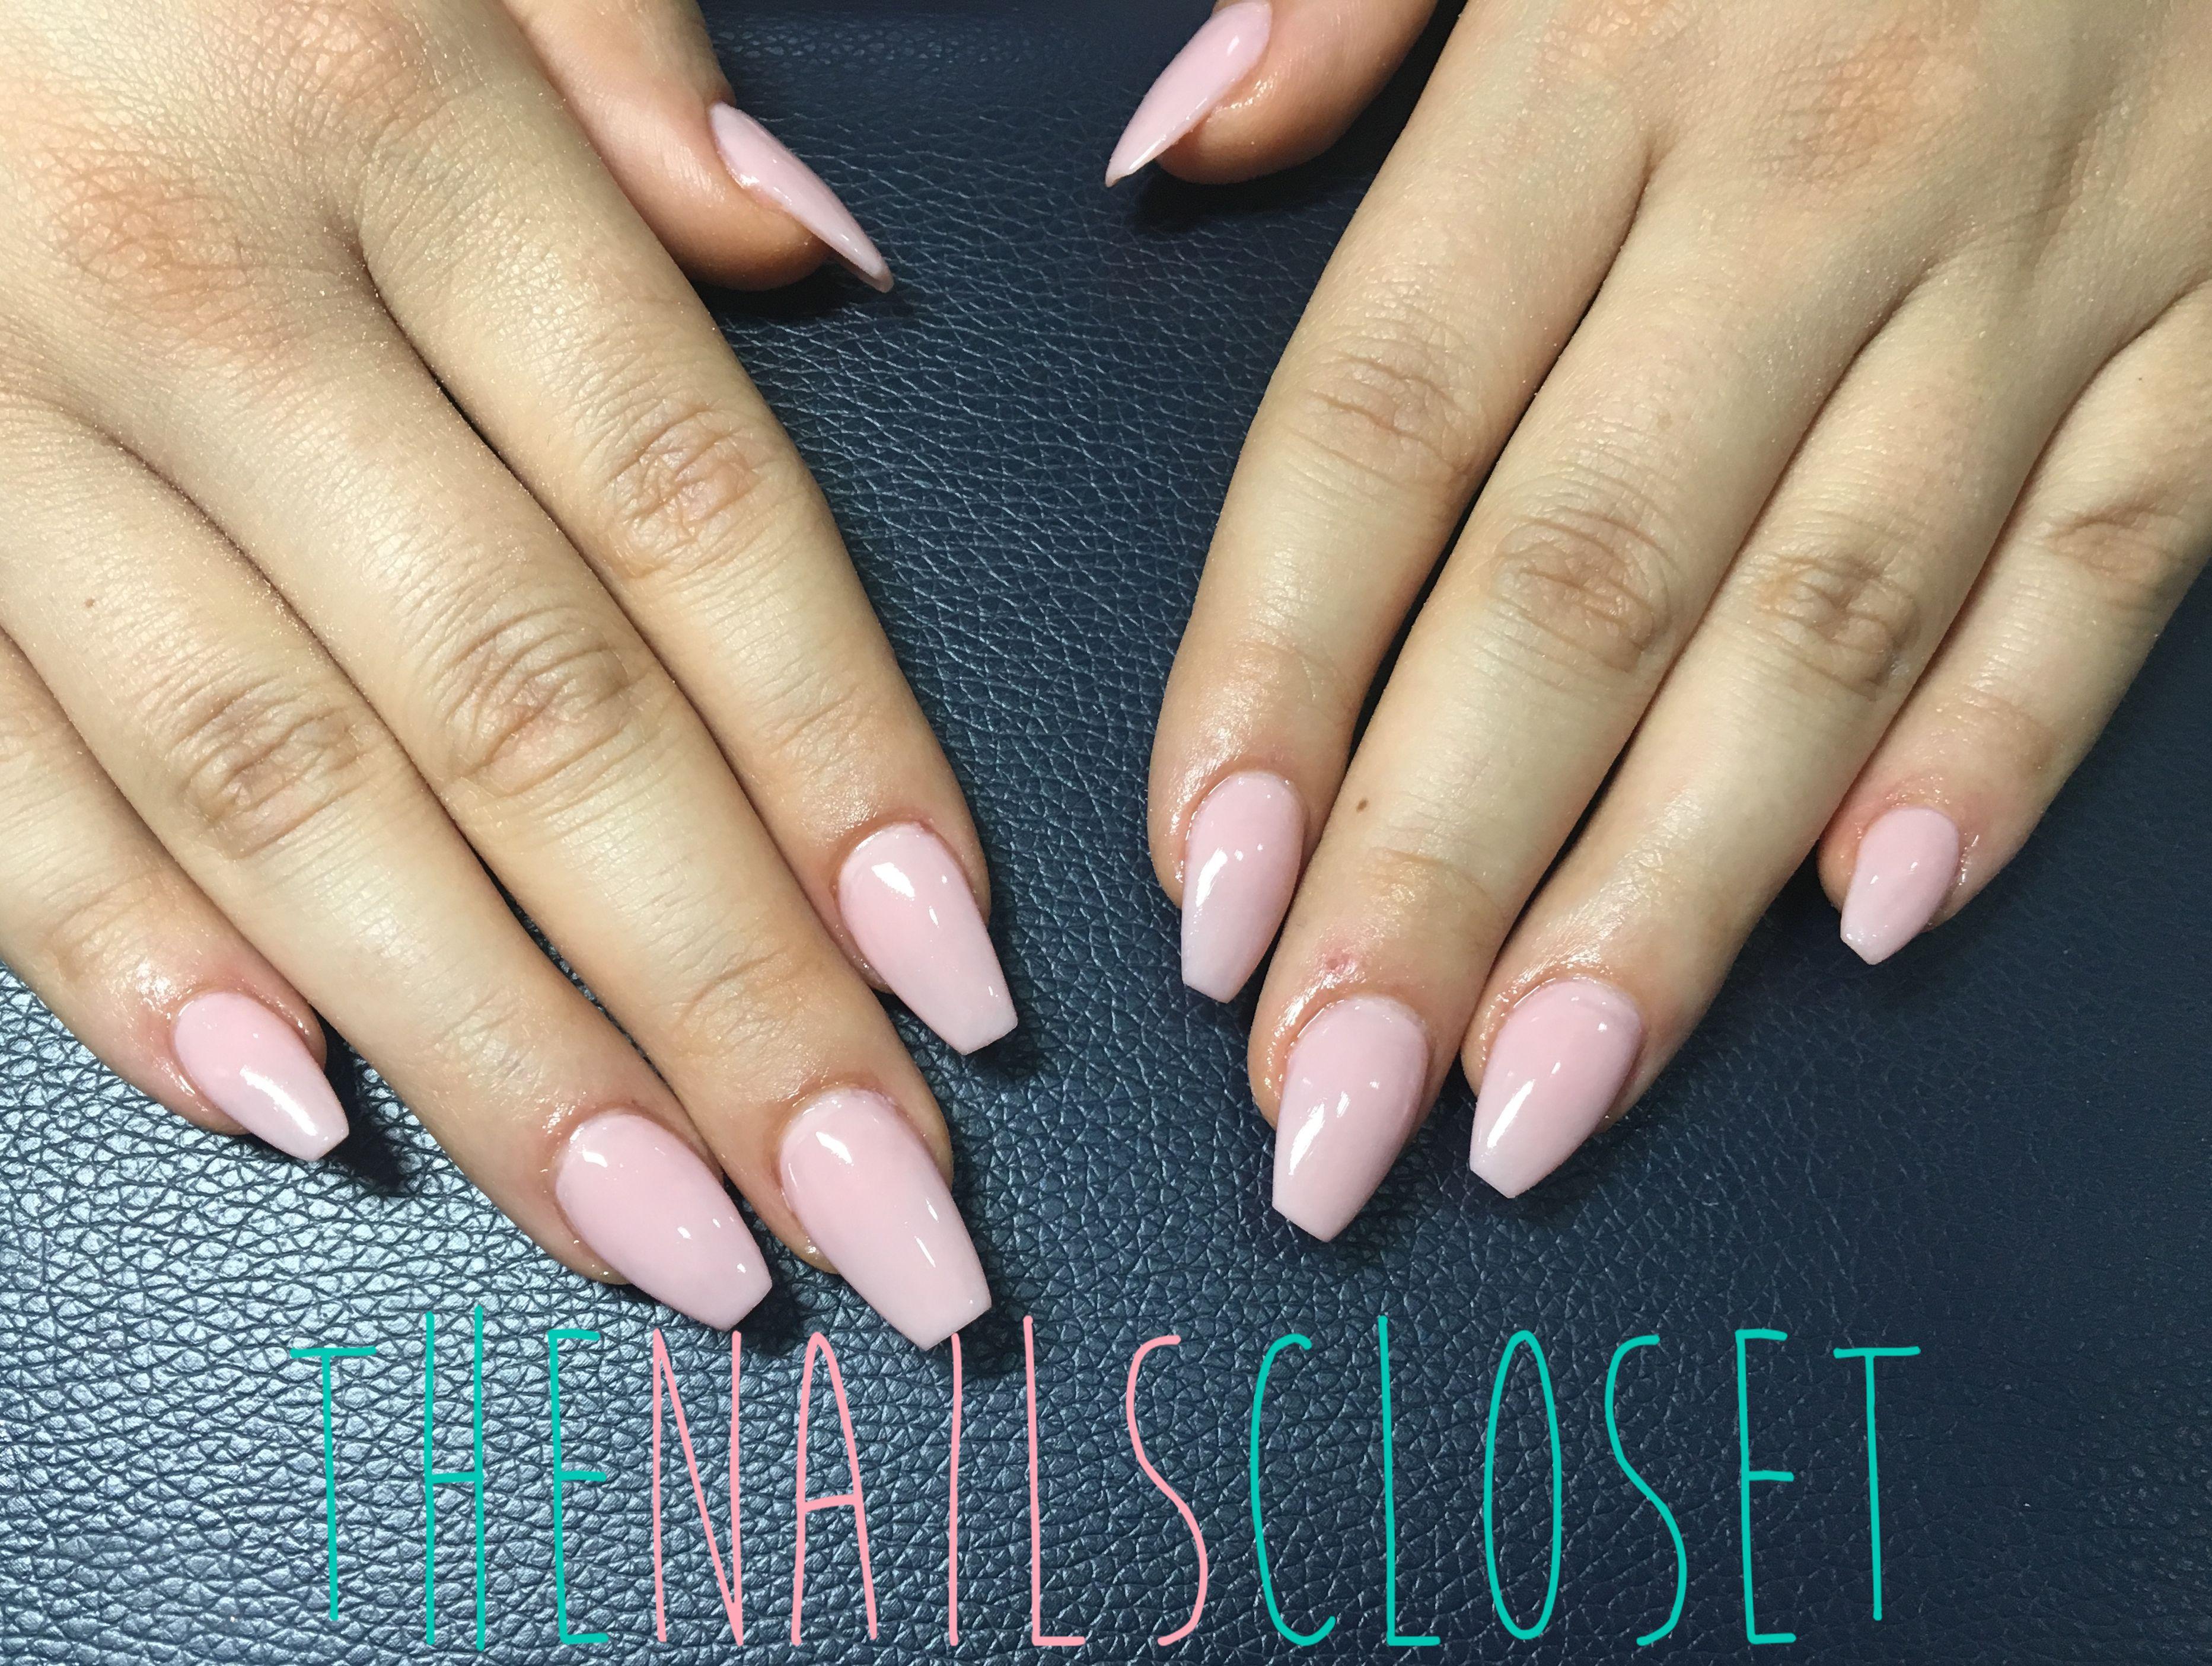 About baby boomer nail art tutorial by nded on pinterest nail art - U As Acr Licas Pintadas Con Esmalte Permanente Rosa Nude U Asdegel U Asacrilicas Nailart